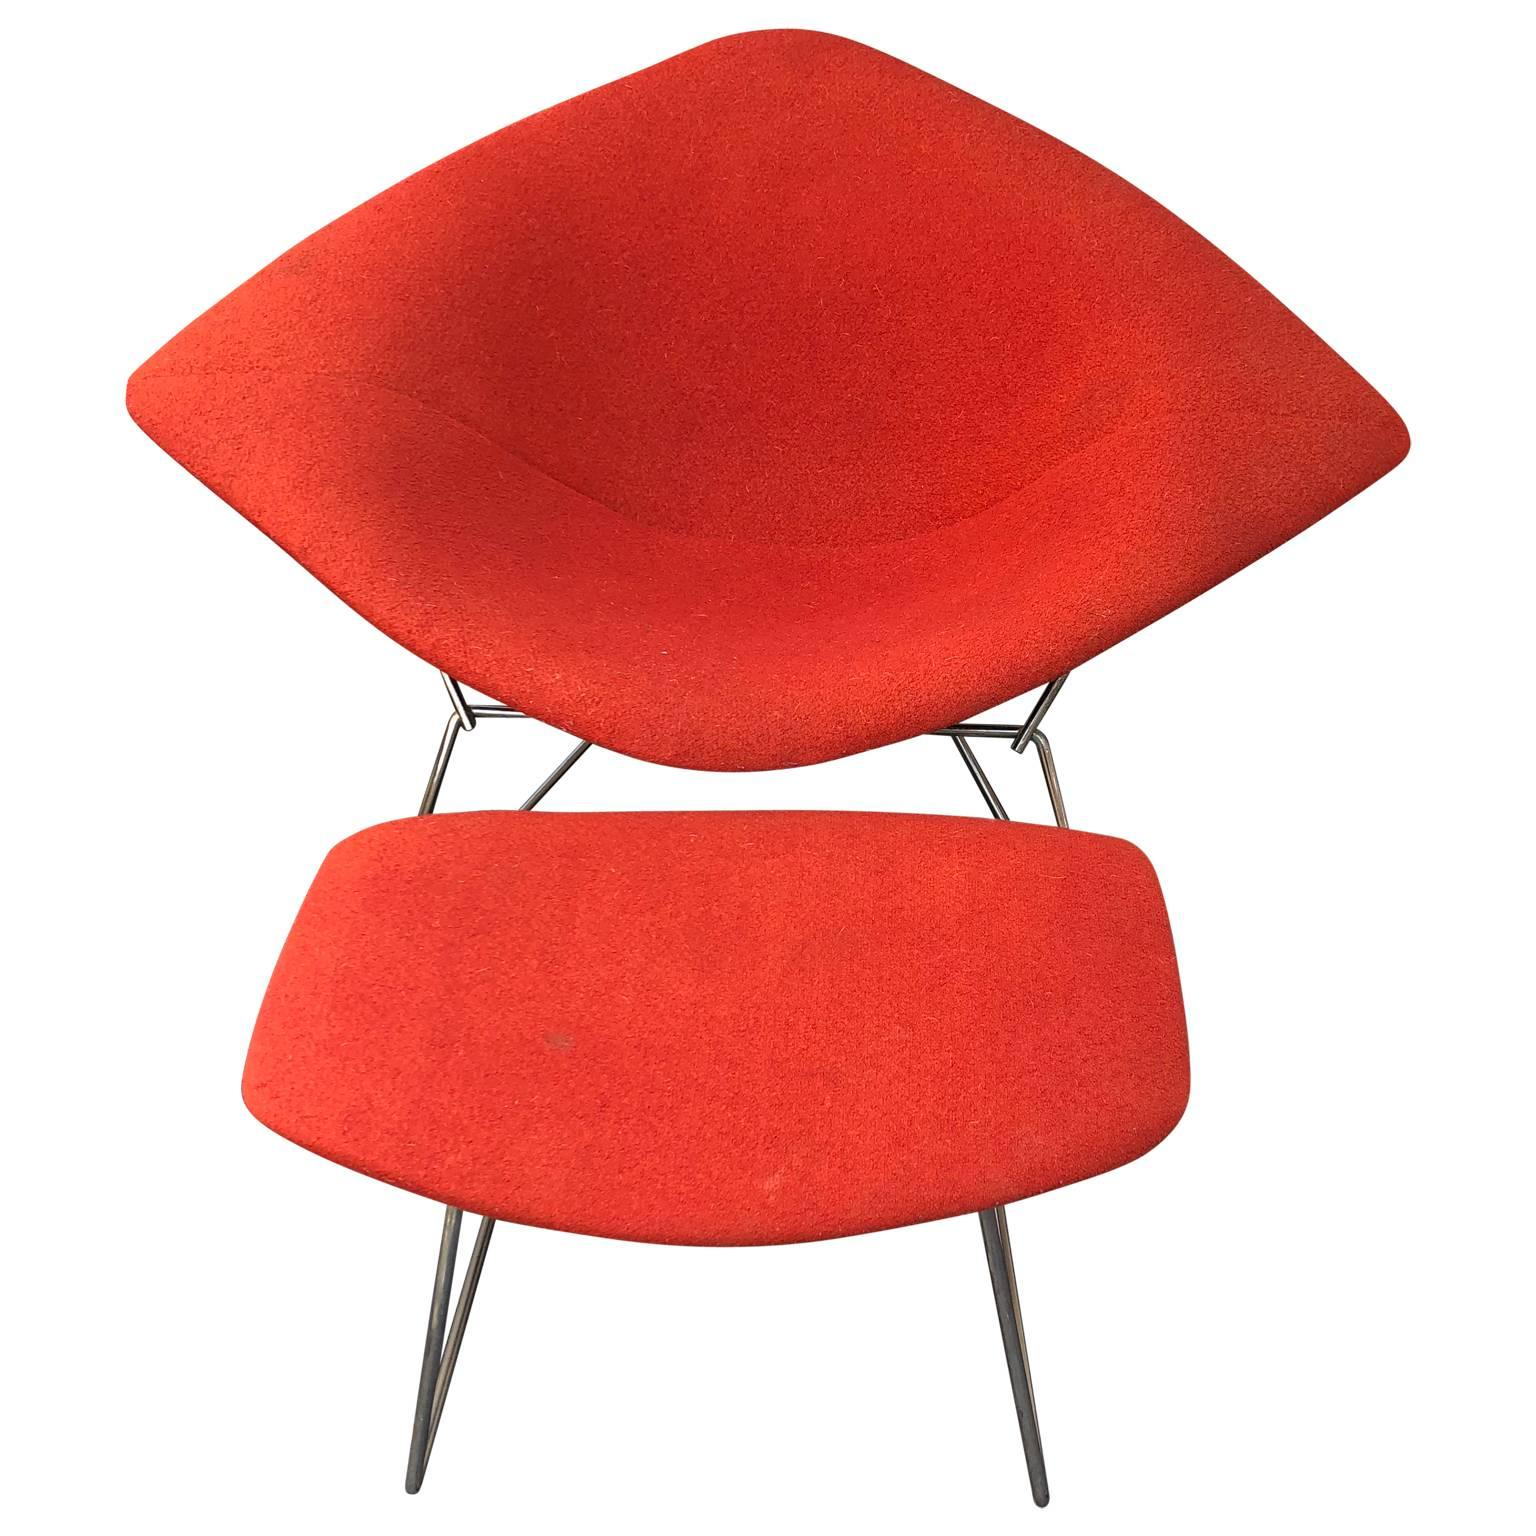 Chromed Midcentury Harry Bertoia Diamond Chair and Ottoman for Knoll